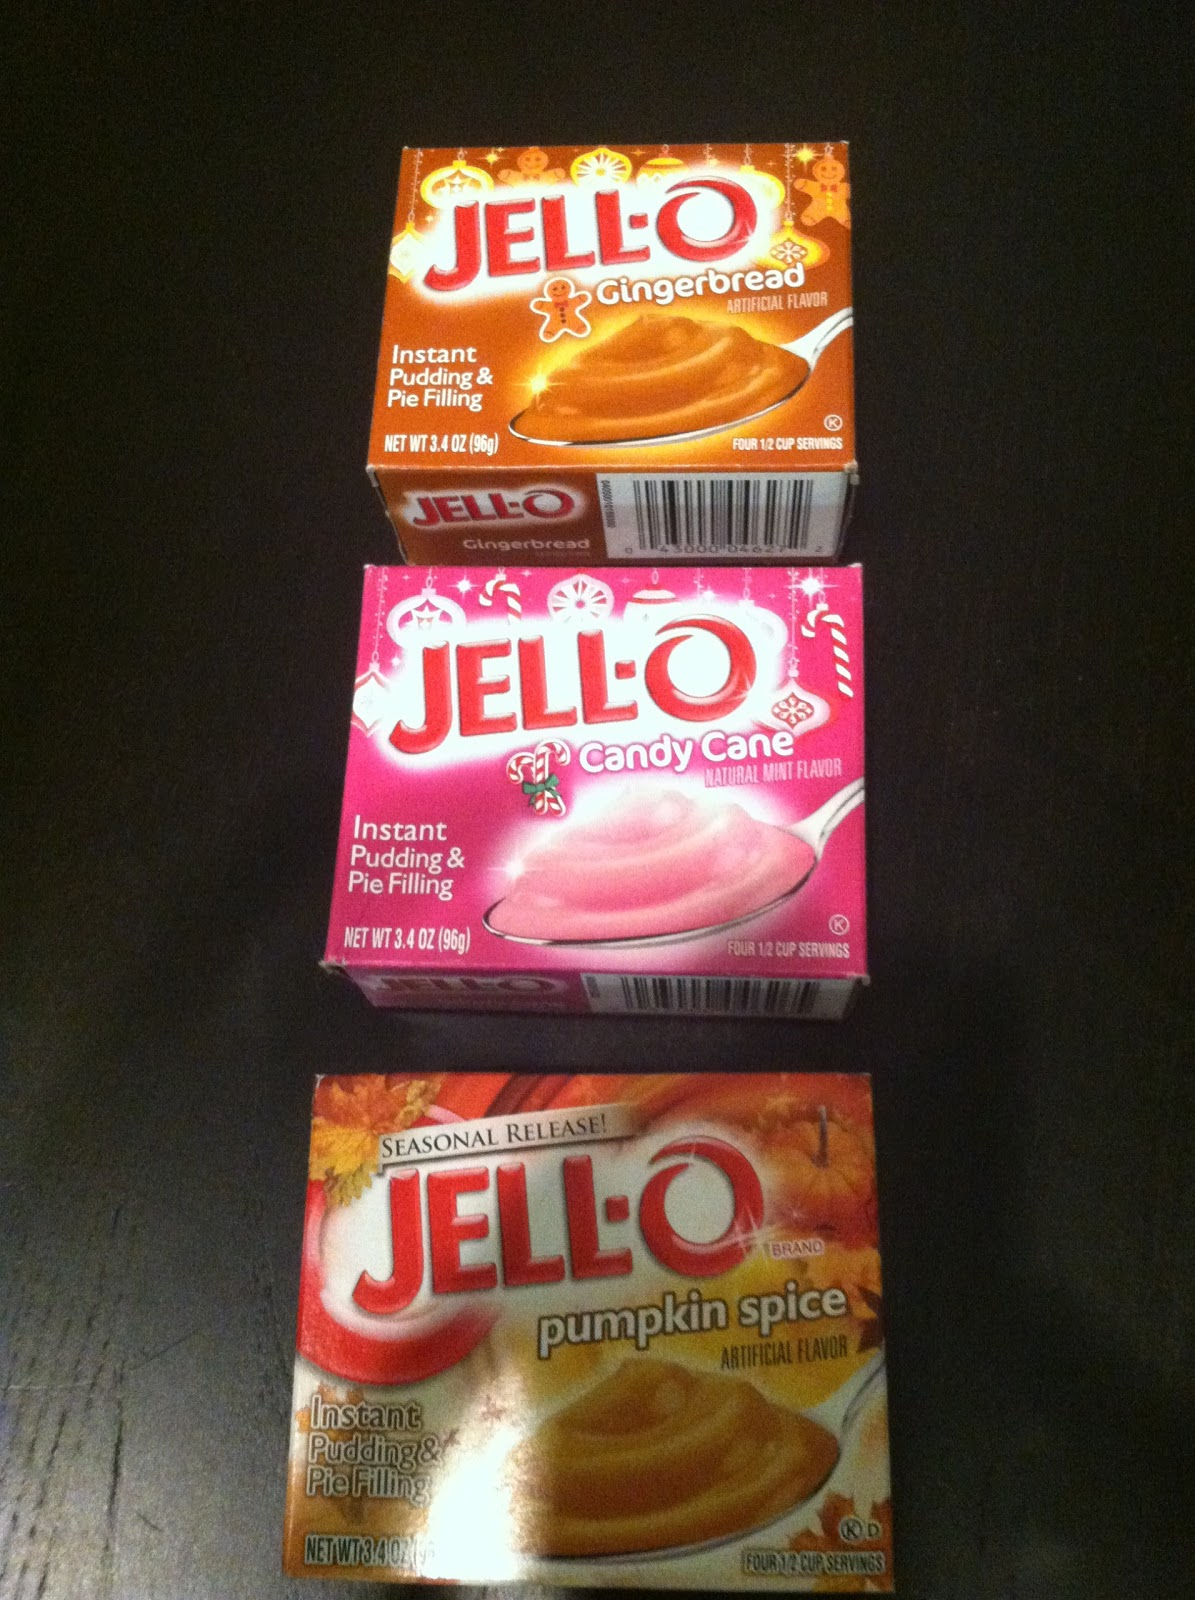 Blackberry Instant Pudding Flavors Jello